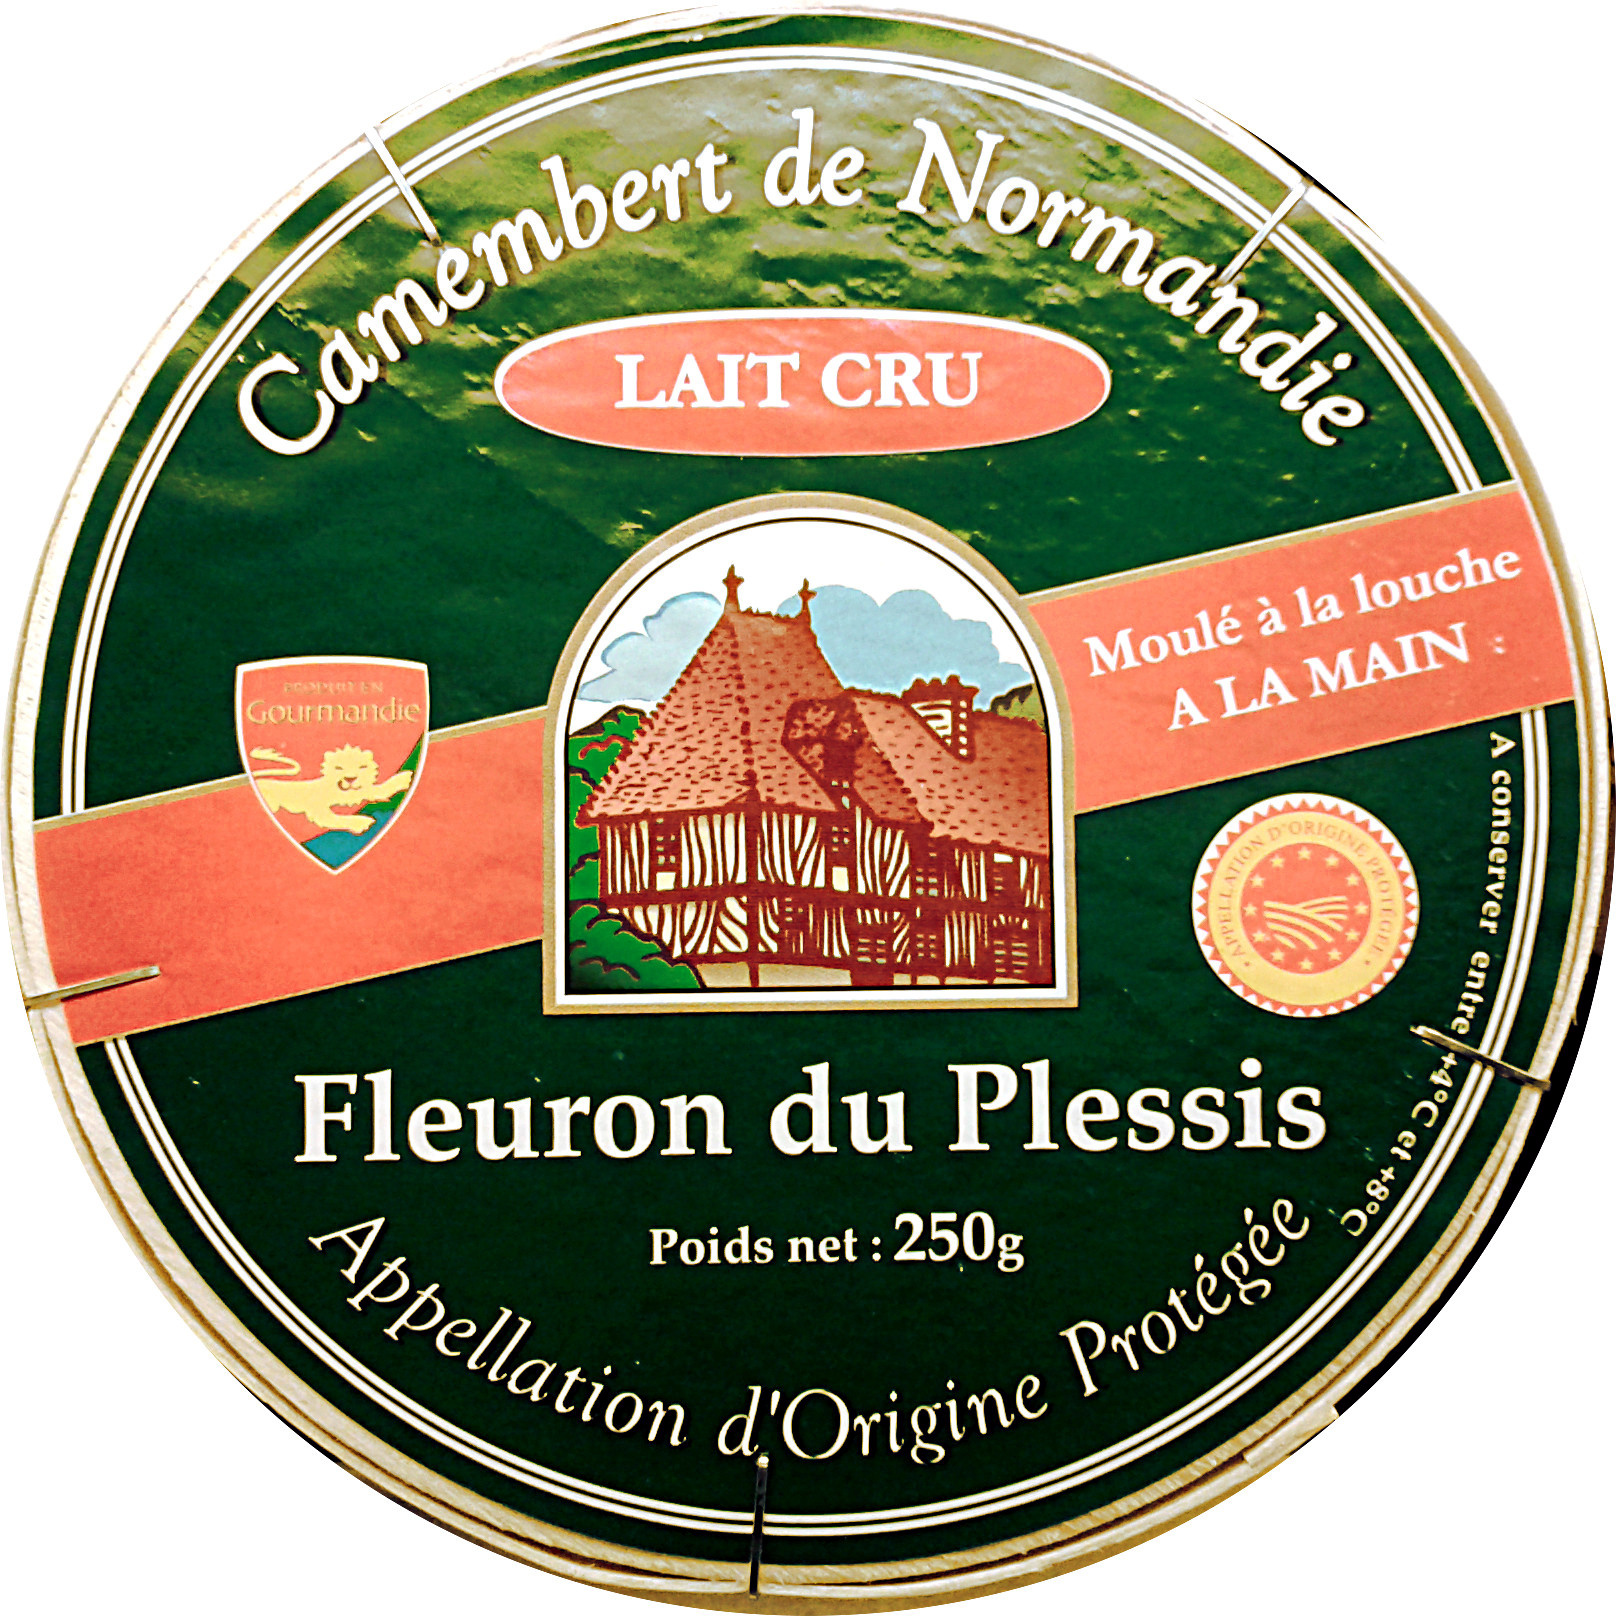 Camembert de Normandie AOP (20% MG) Lait cru - Product - fr